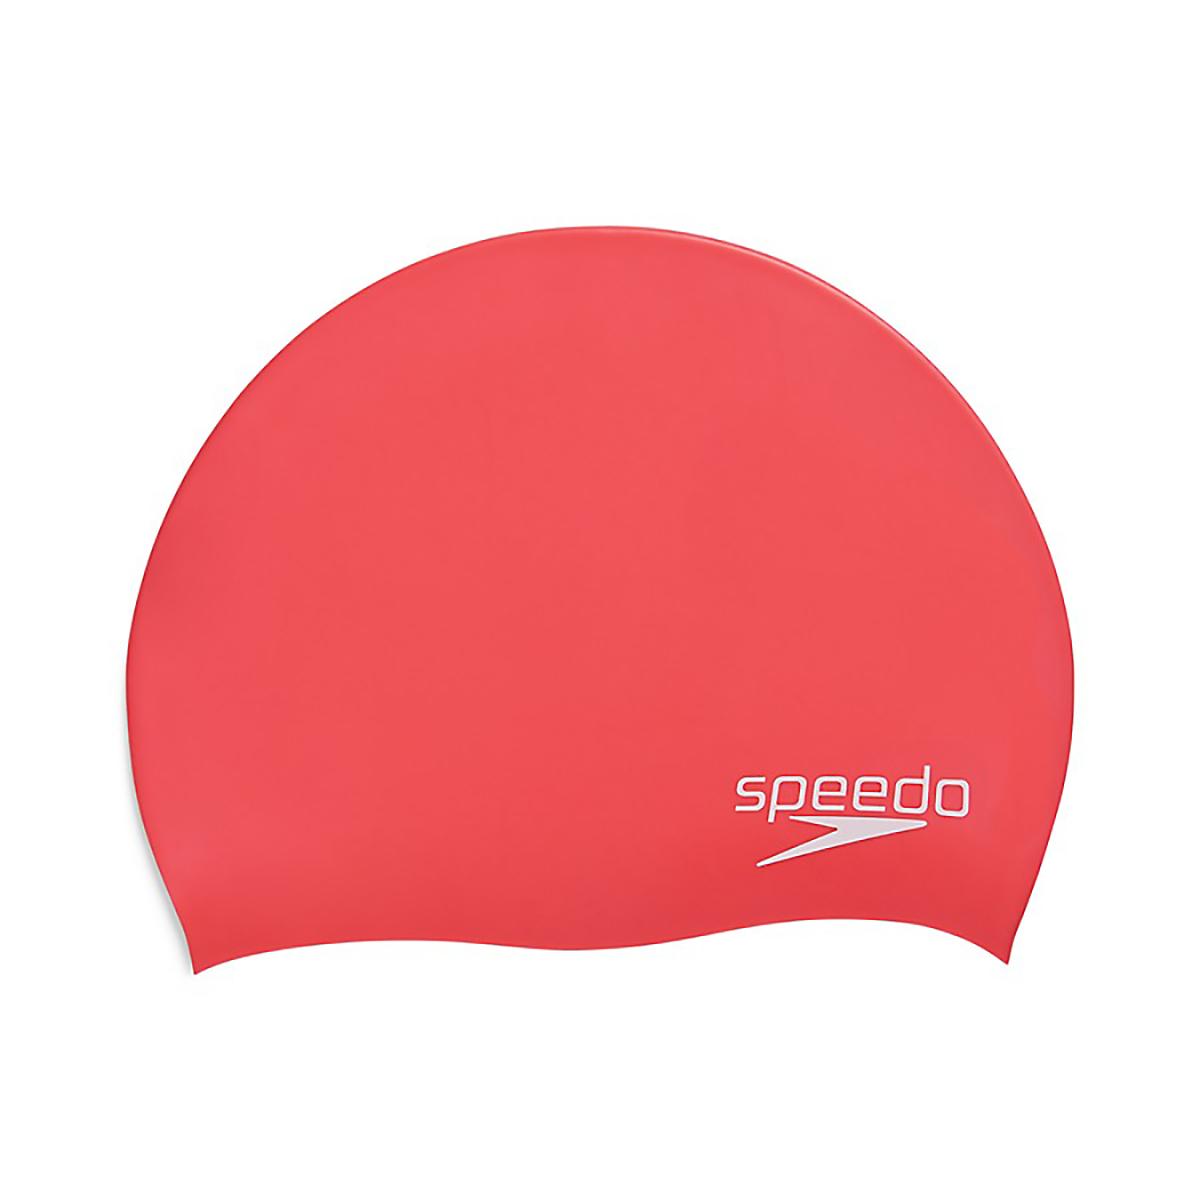 Speedo Elastomeric Solid Silicone Swim Cap - Color: Red, Red, large, image 1